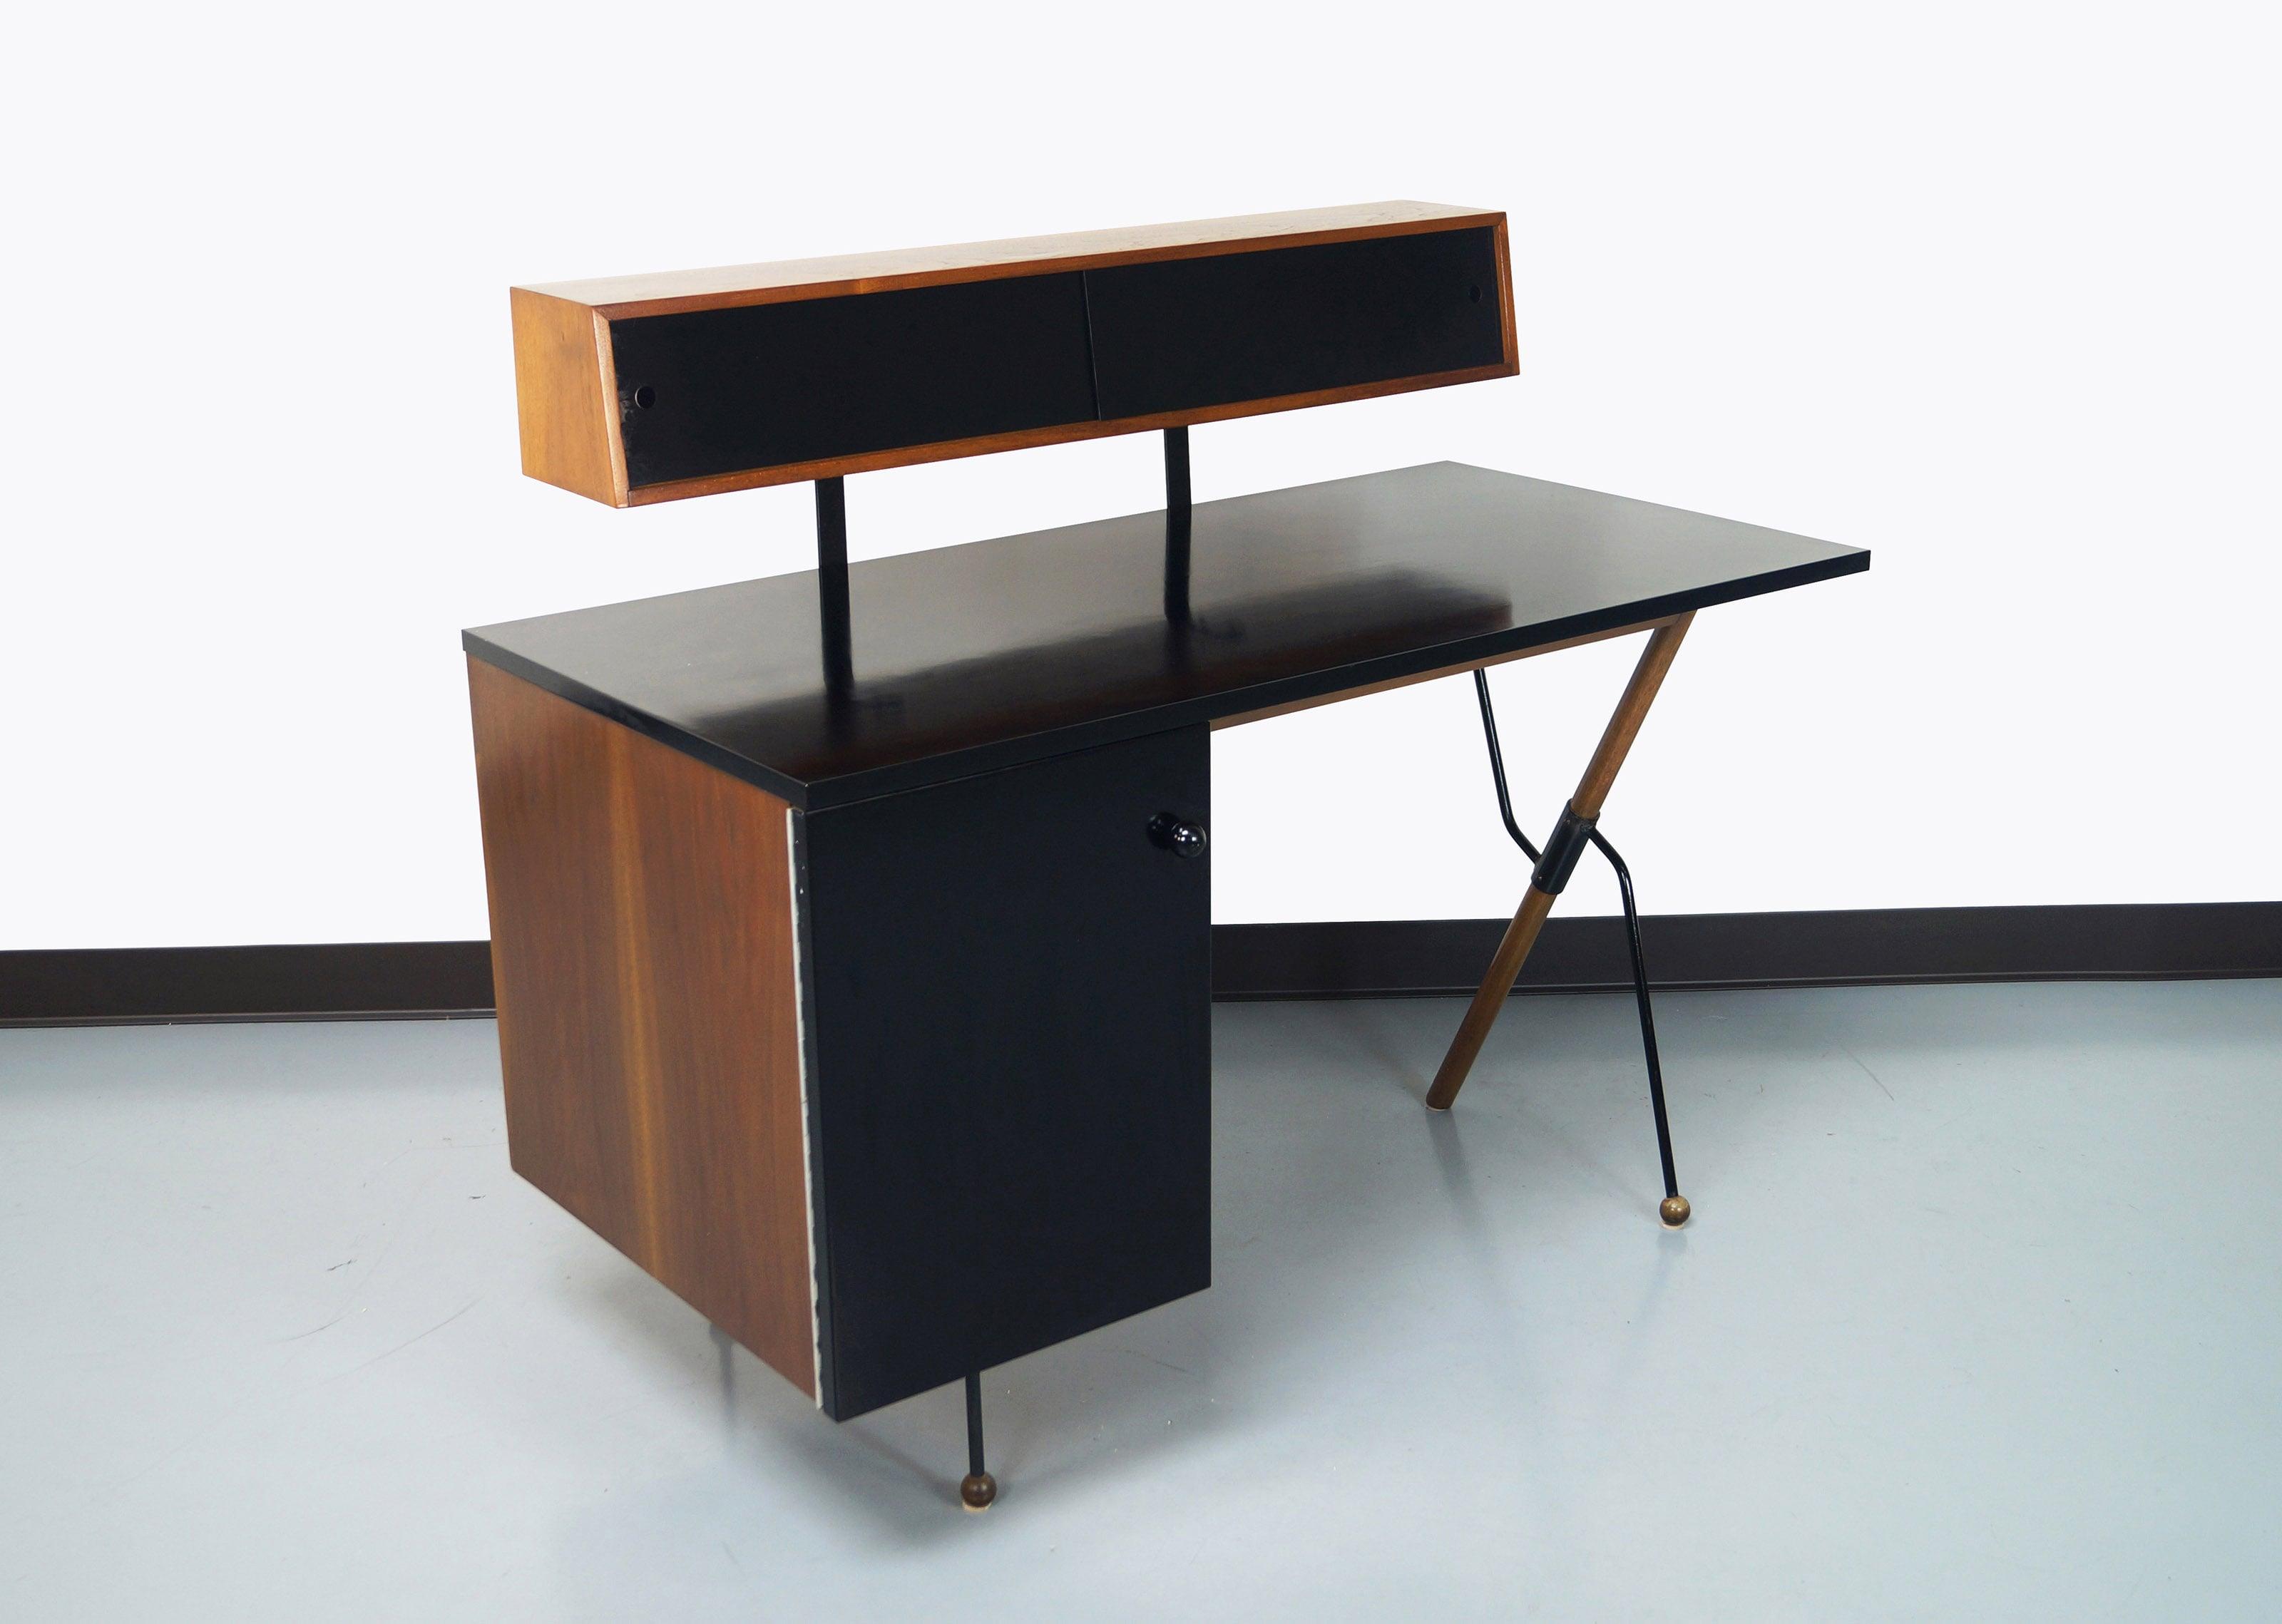 Series 62 Desk by Greta M. Grossman